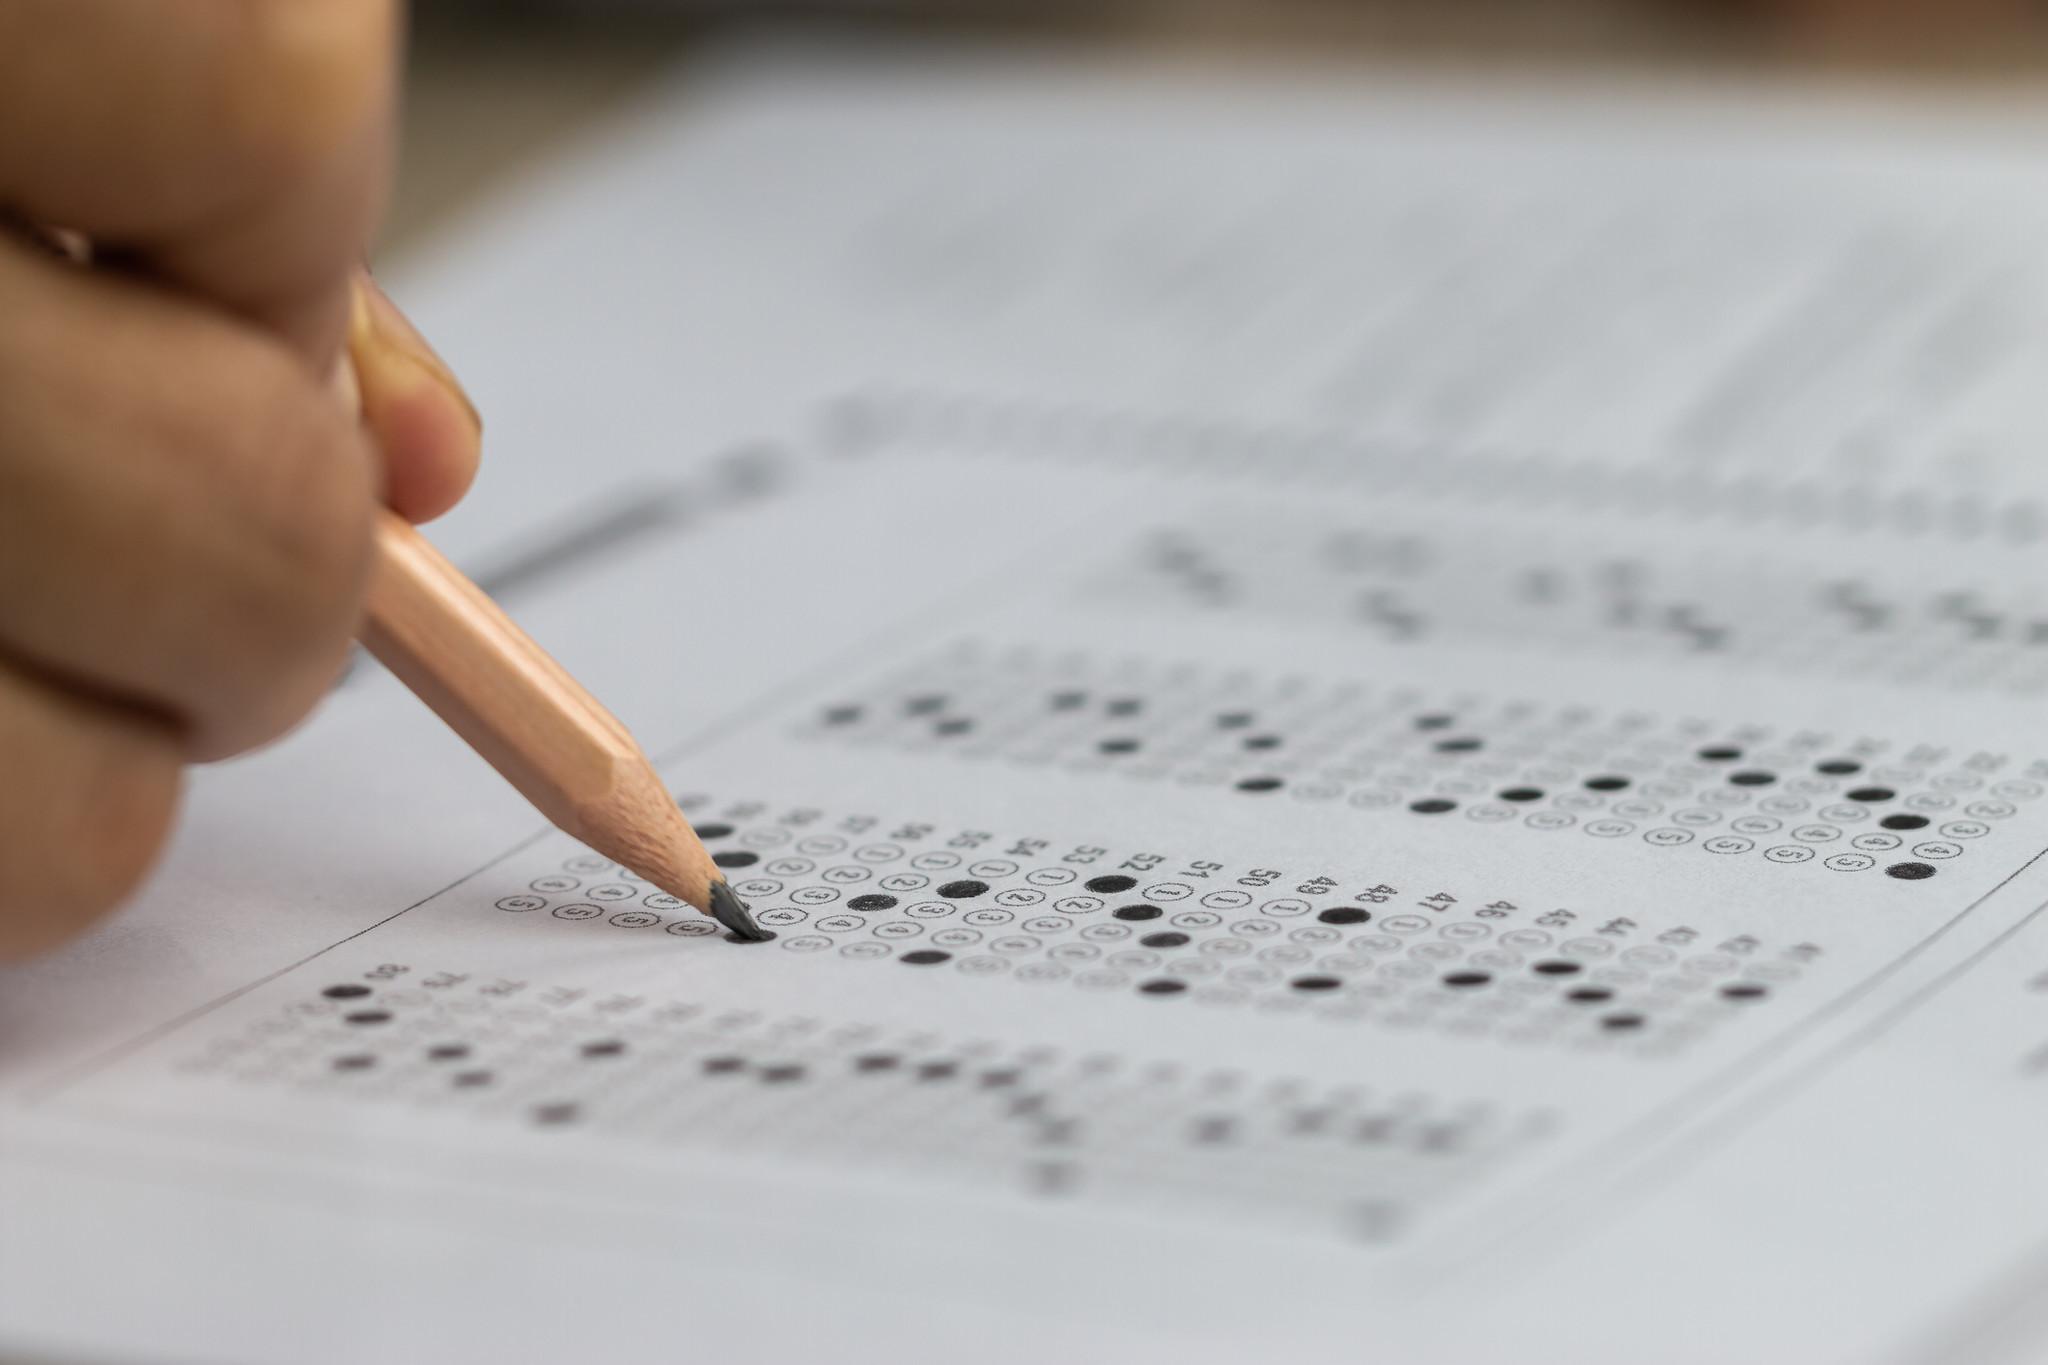 Judgements over discriminatory NYC teachers exam raise possibility of $3 BILLION case